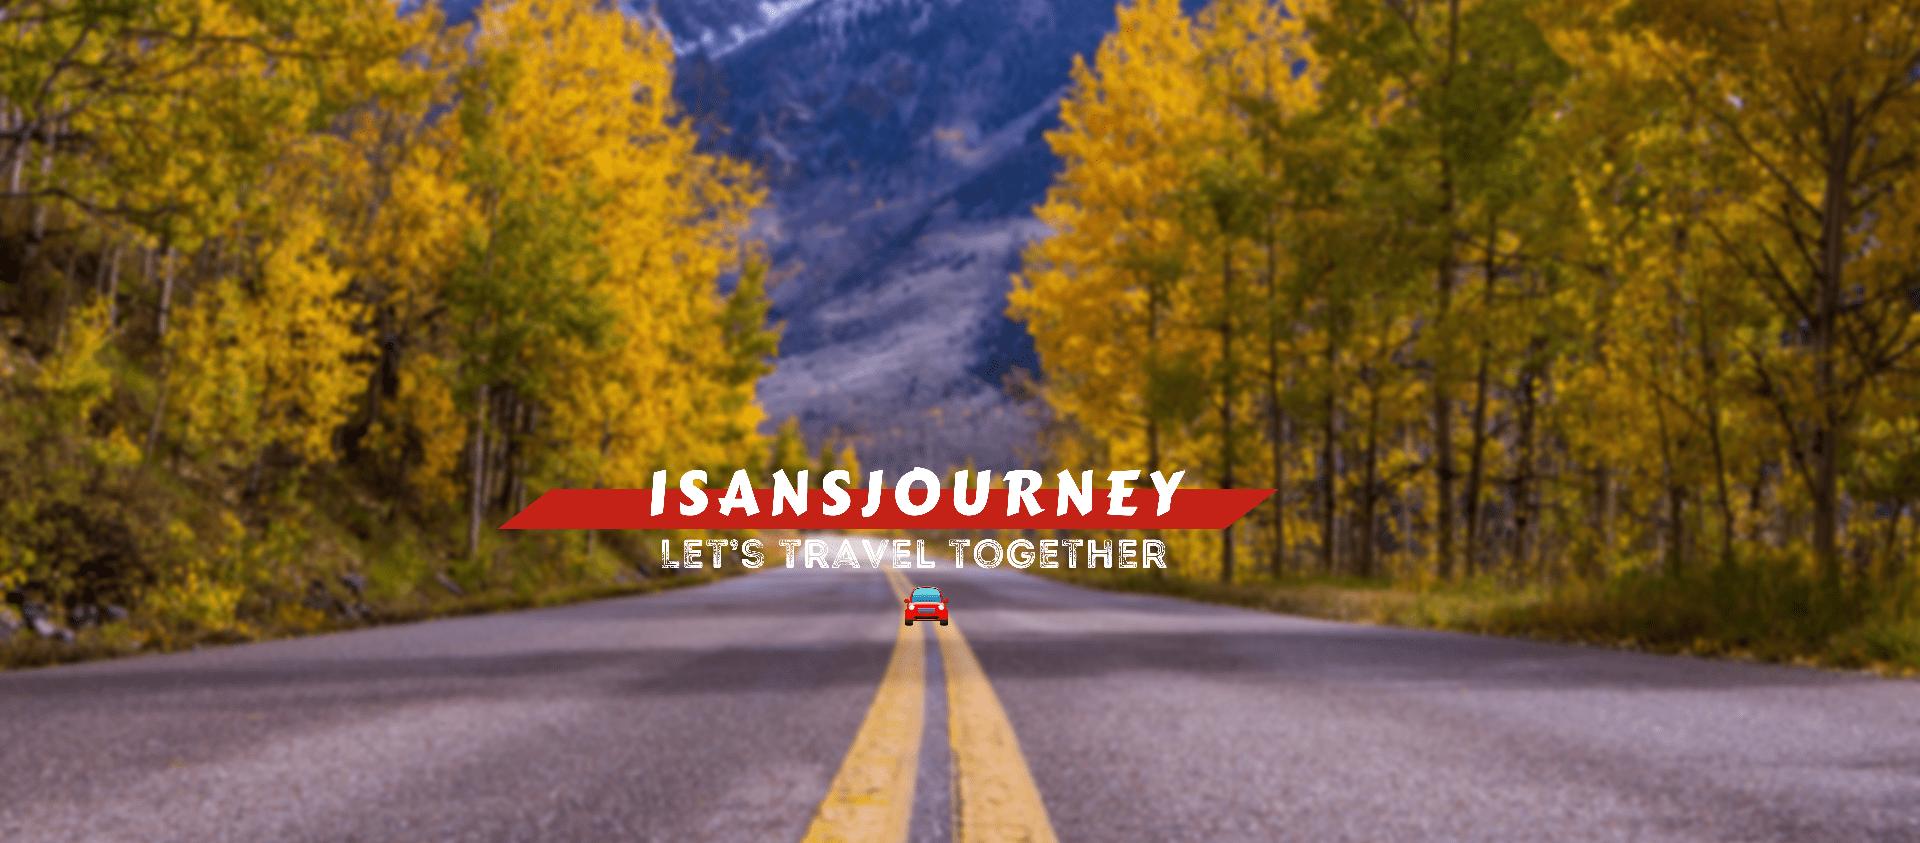 iSANsjourney